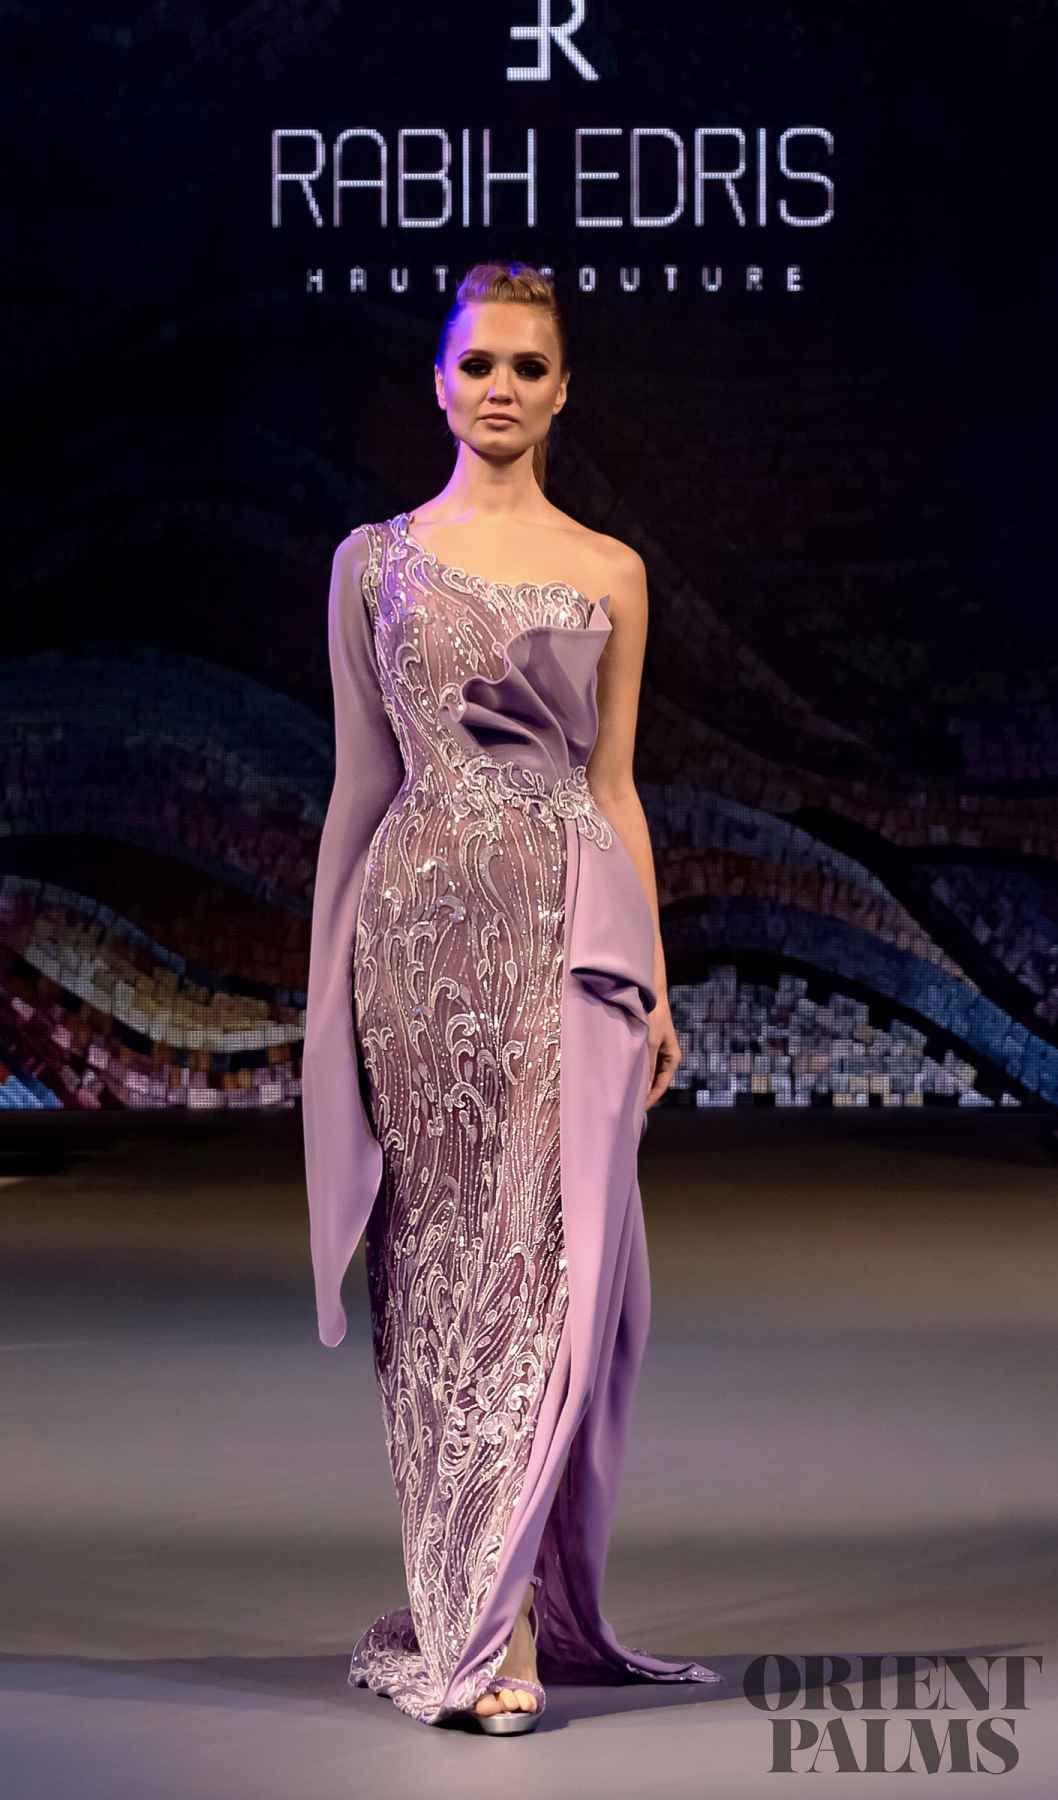 Rabih Edris  Abendkleider elegant, Kleiderstile, Designer